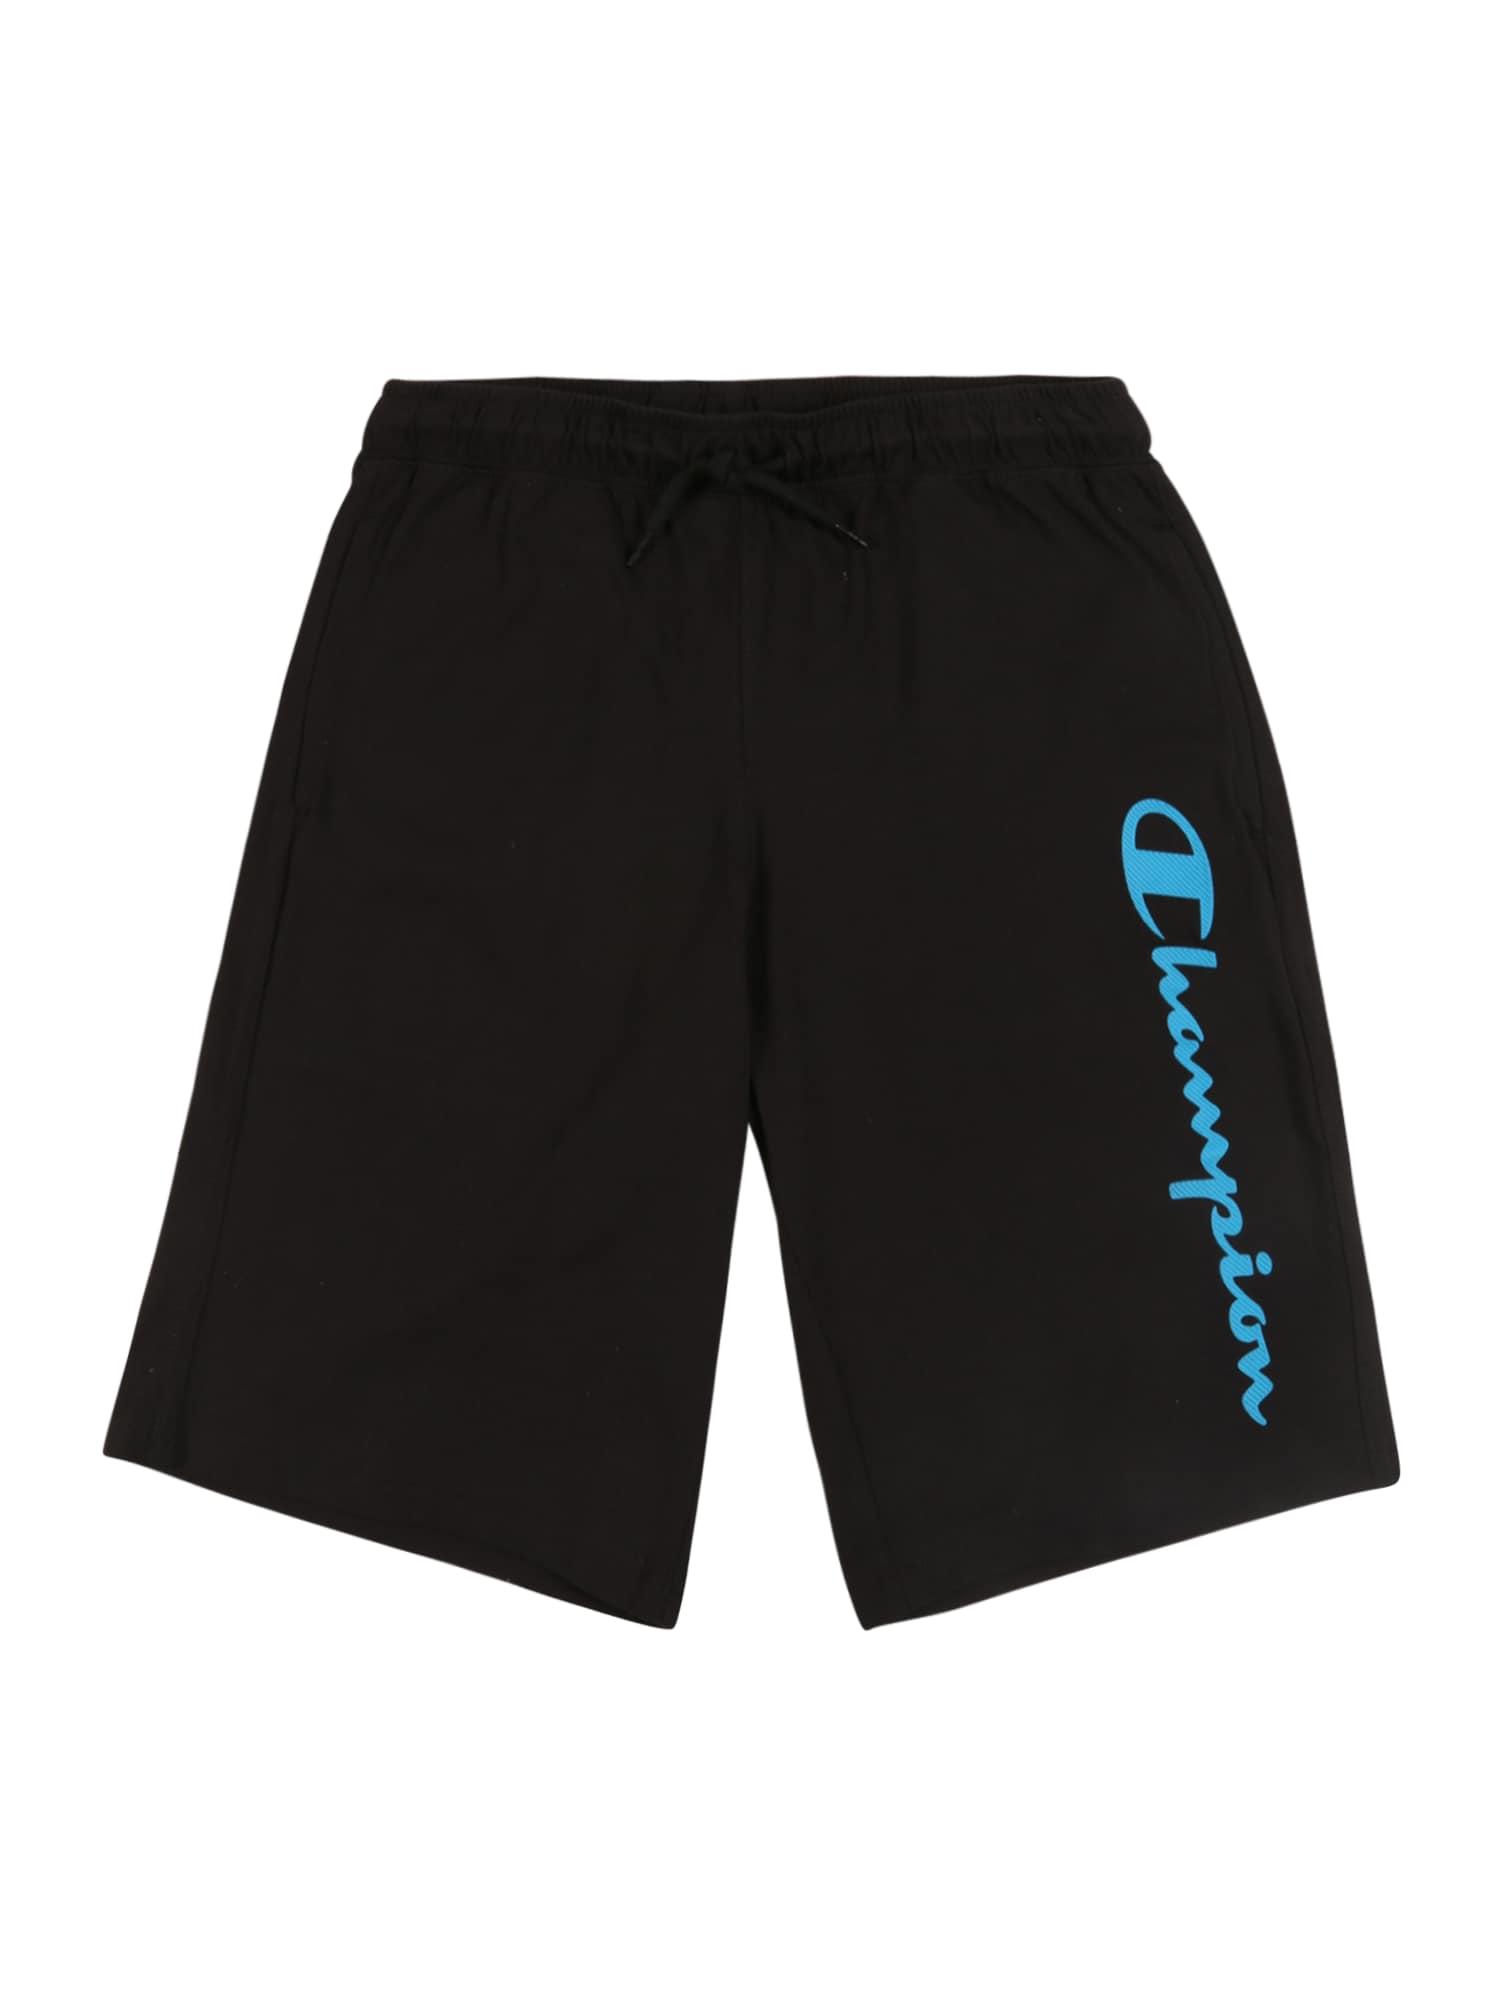 Champion Authentic Athletic Apparel Kelnės 'BERMUDA' juoda